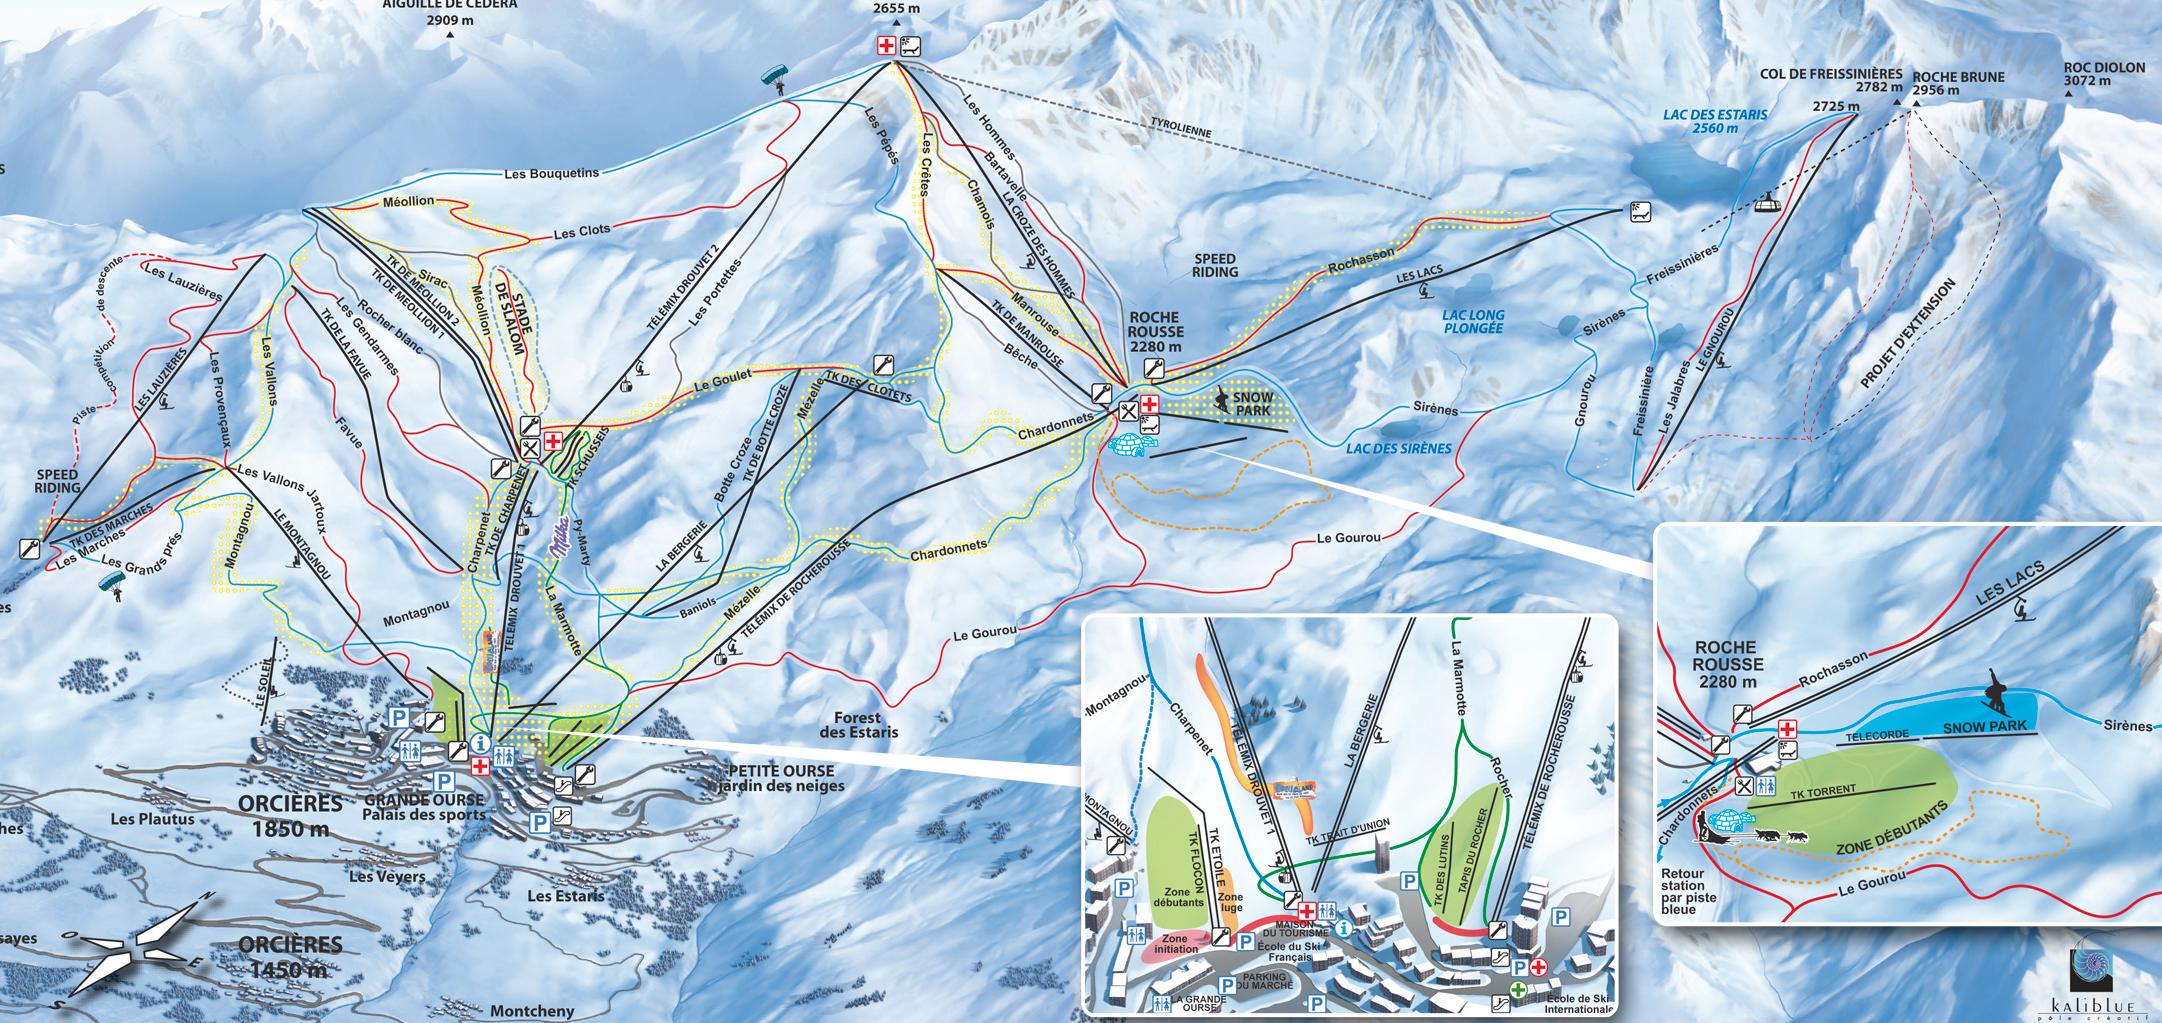 serre chevalier piste map pdf